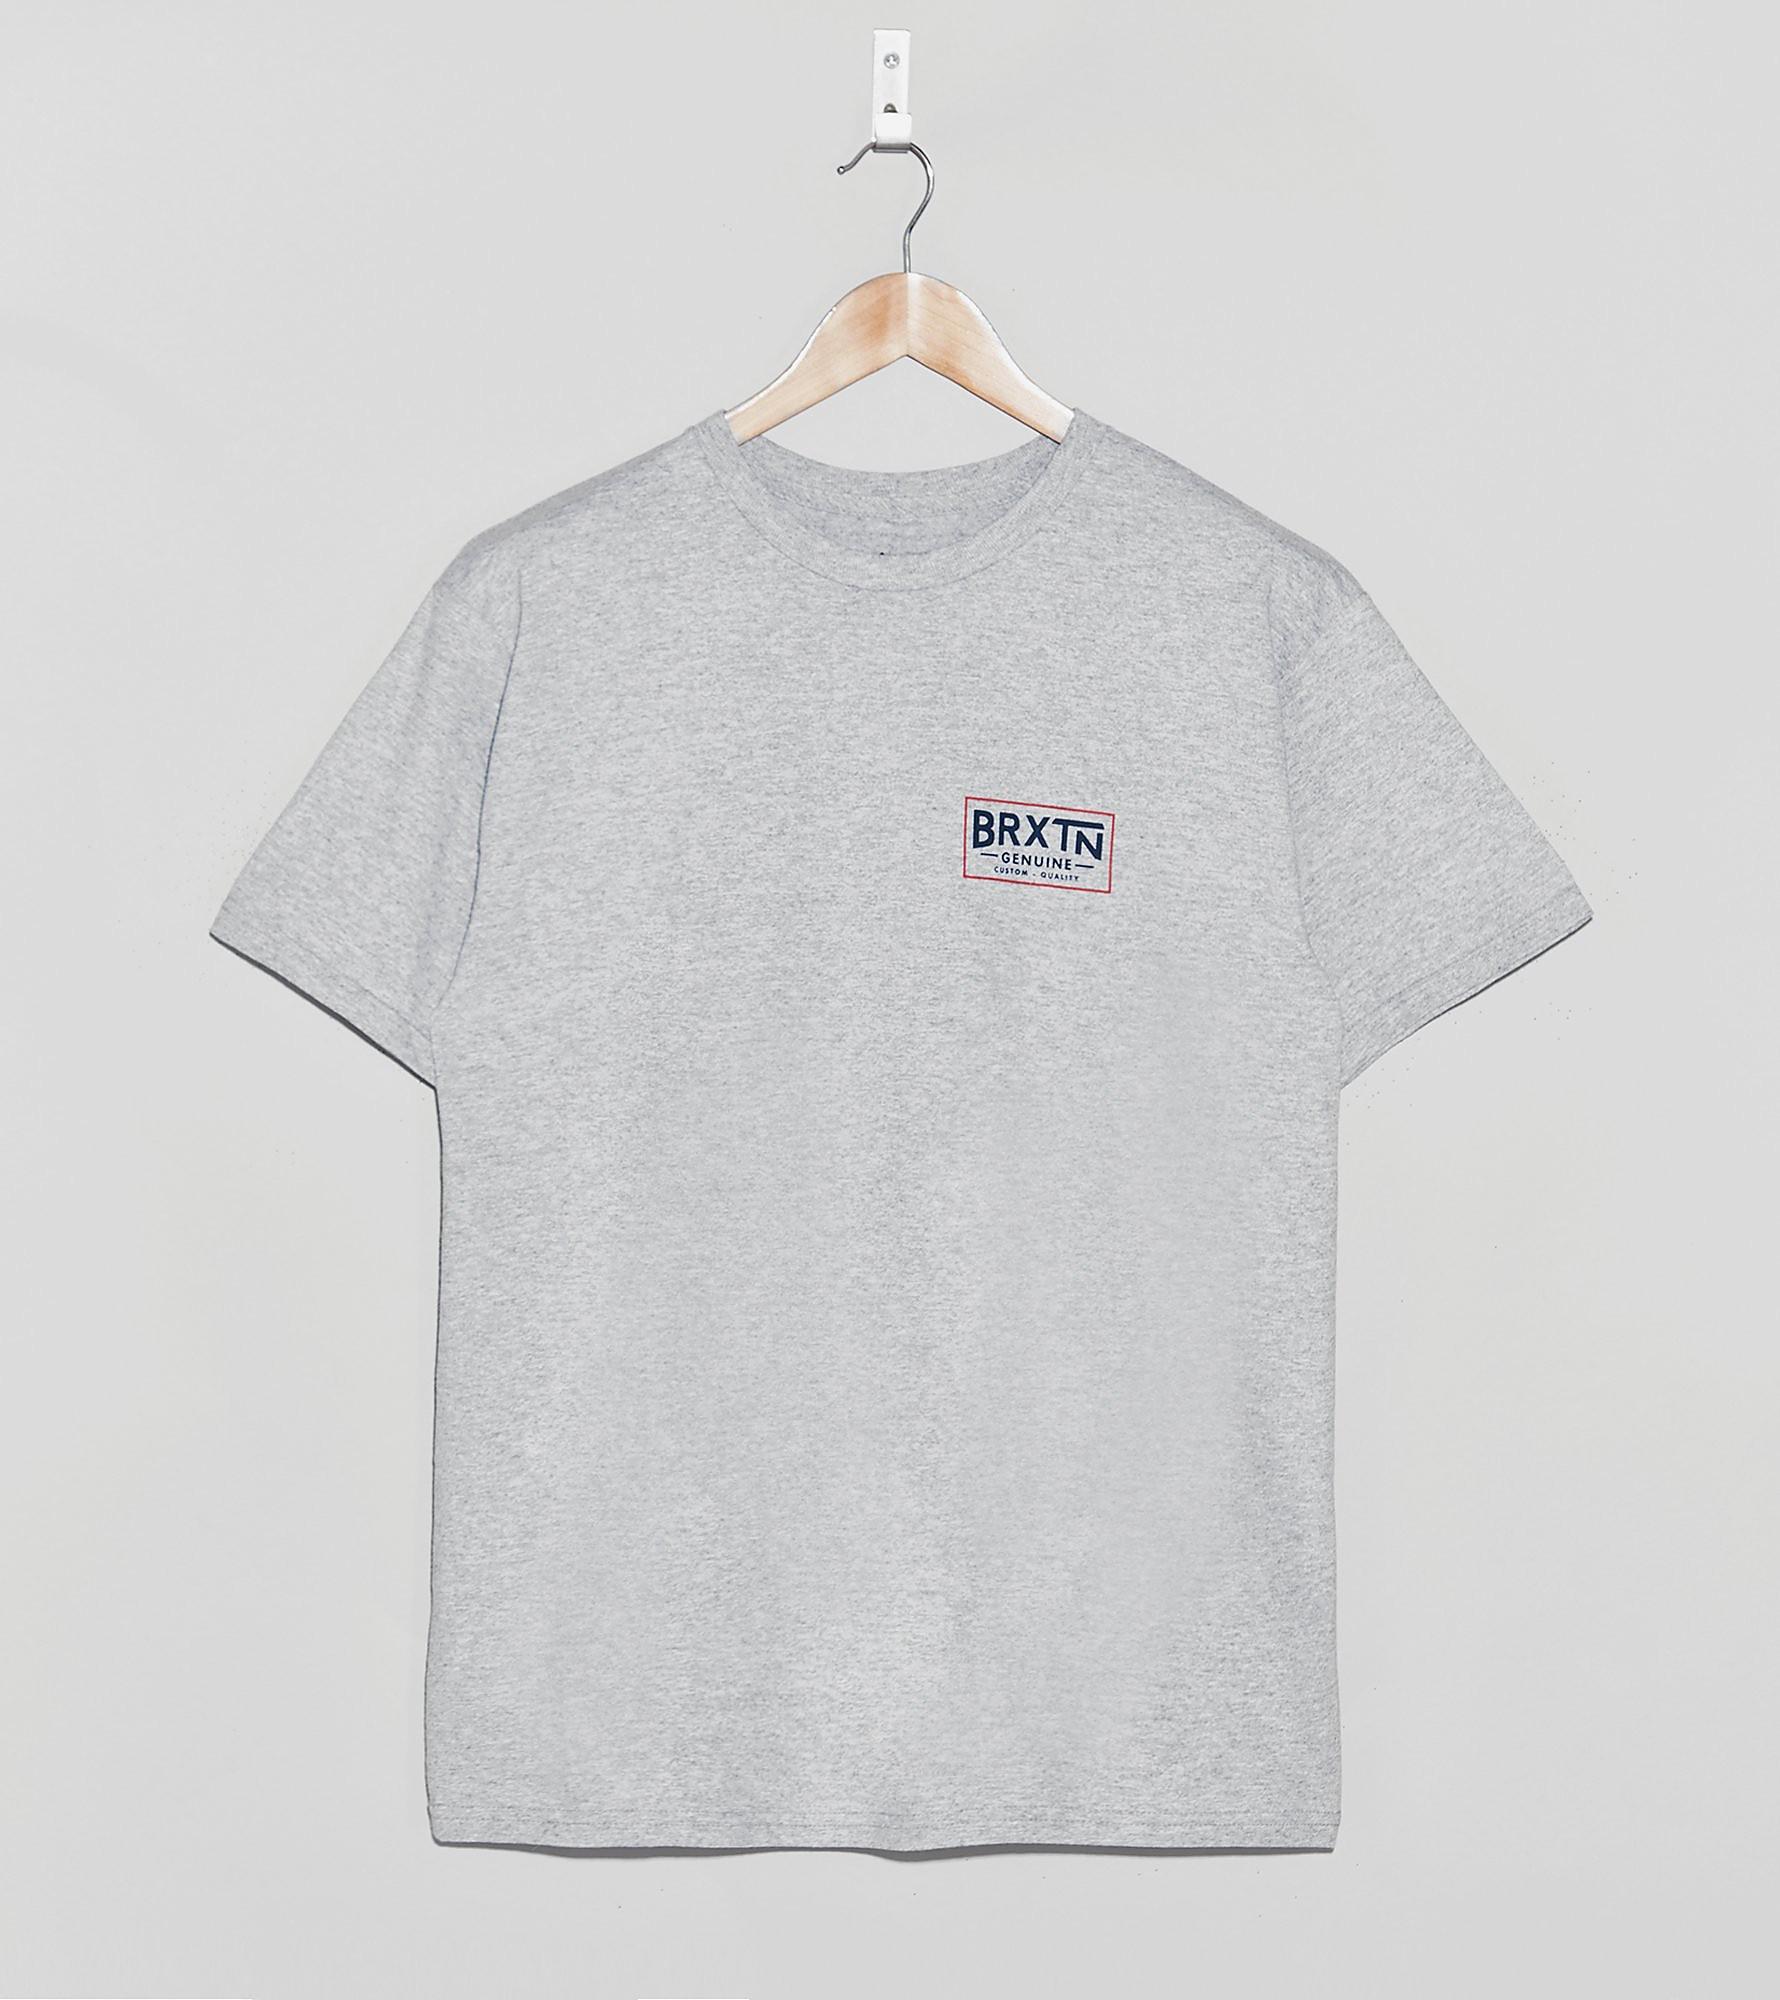 Brixton Dunning T-Shirt